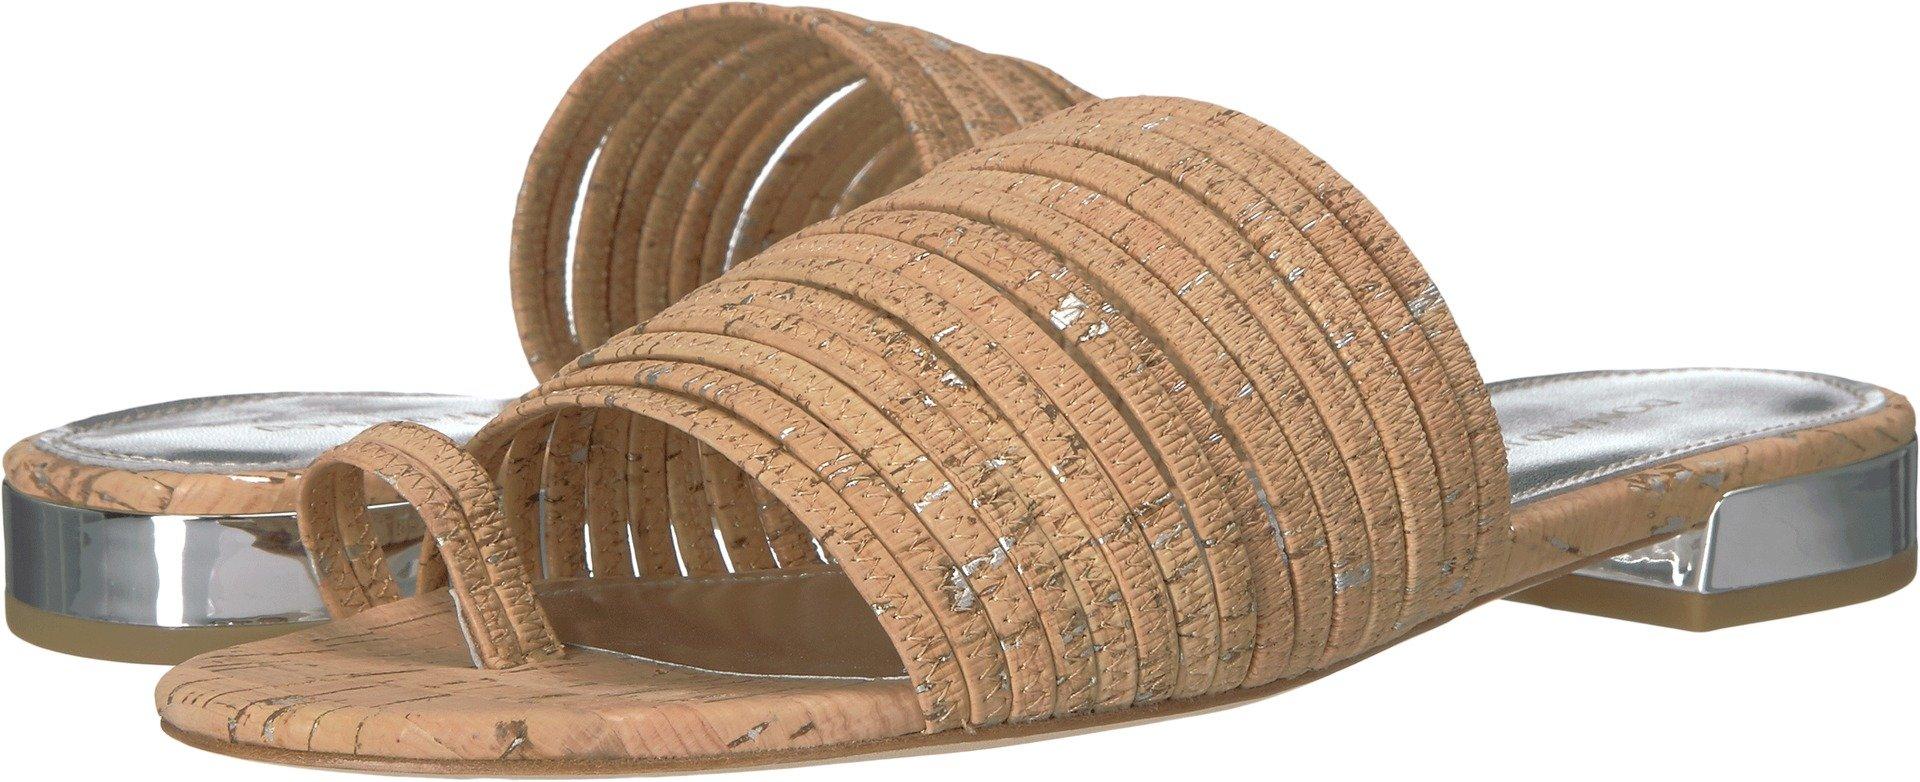 Donald J Pliner Women's Frea Natural/Silver Sandal